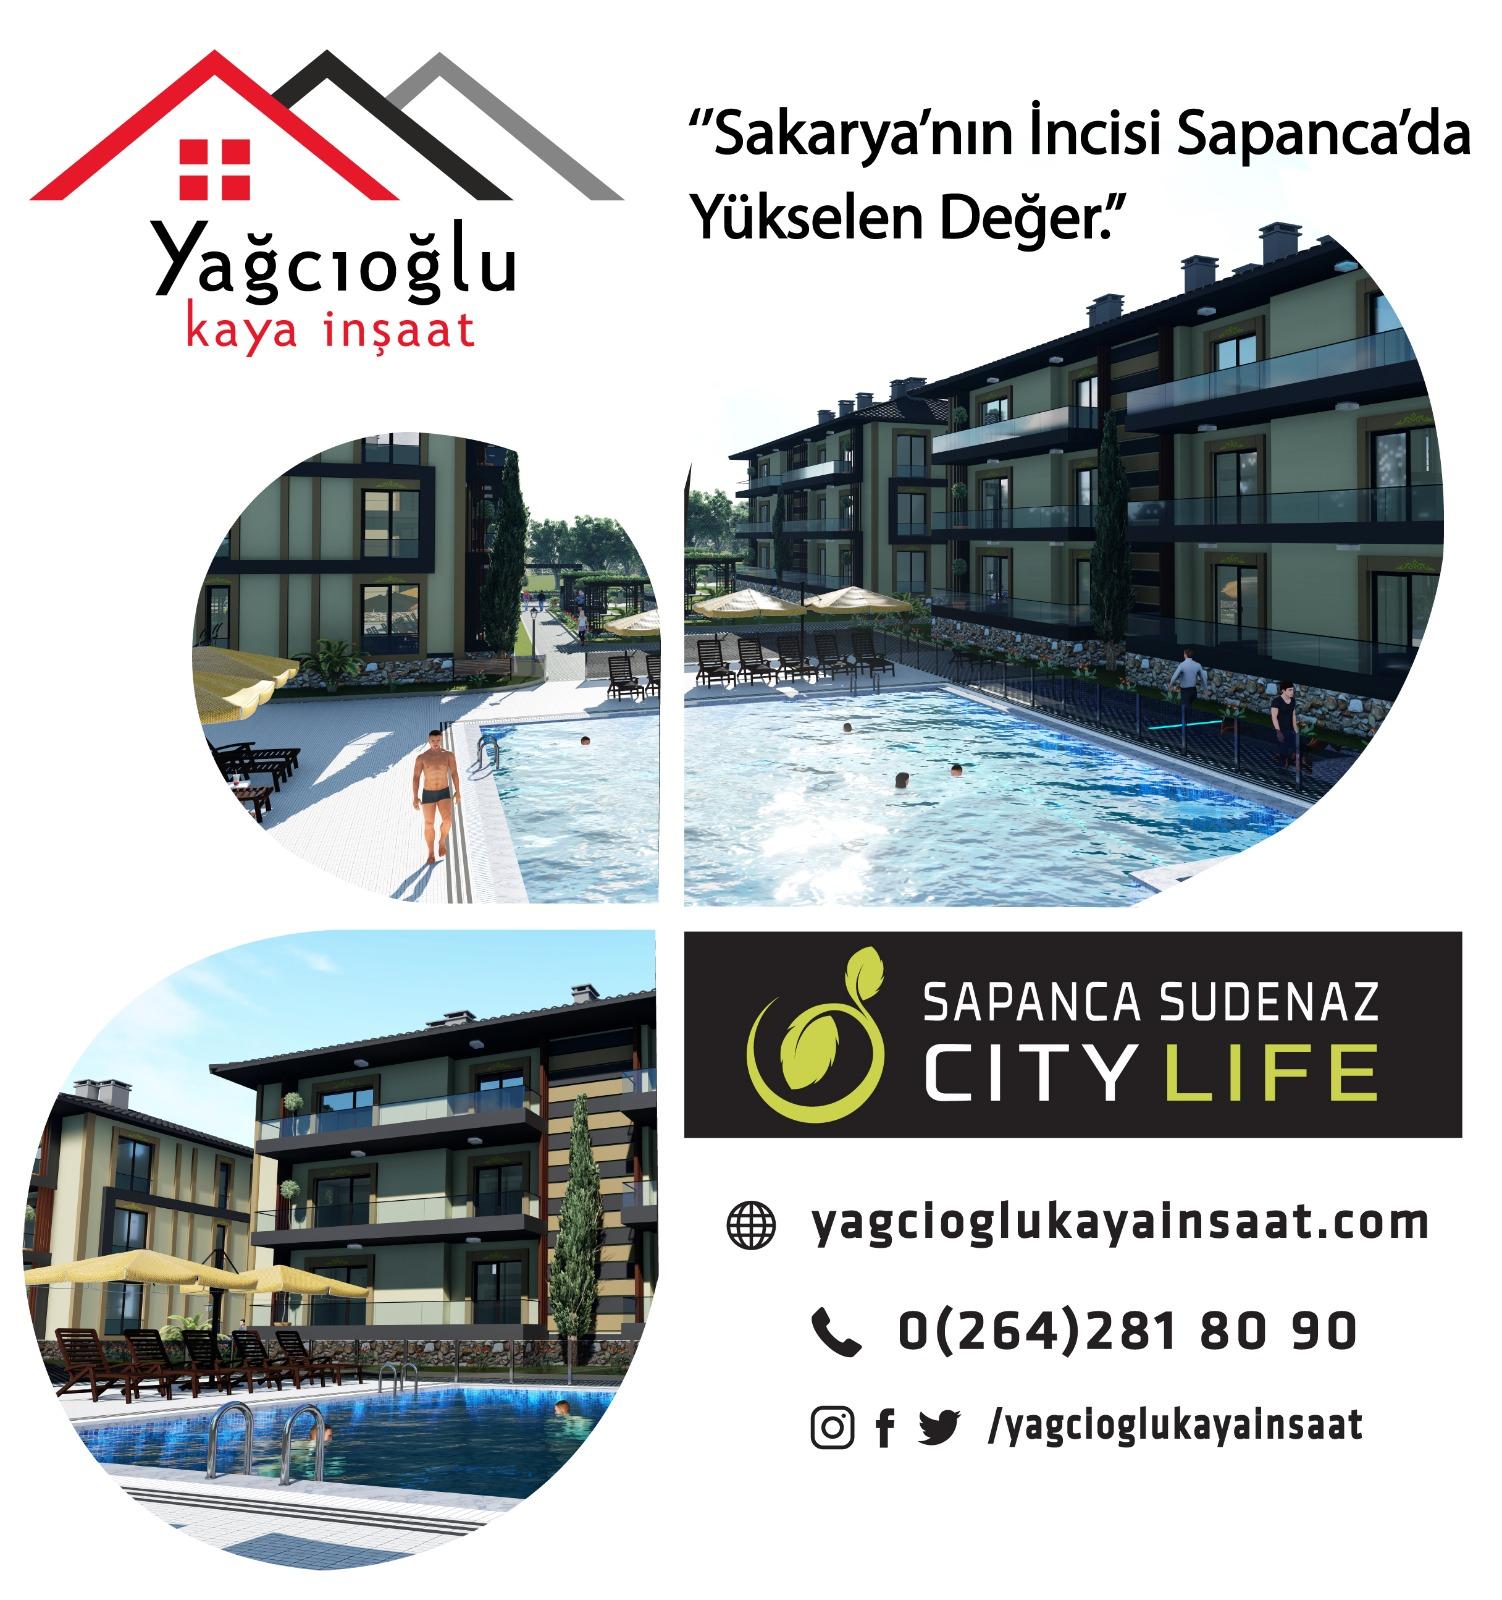 http://www.yagcioglukayainsaat.com/wp-content/uploads/sapanca.jpg